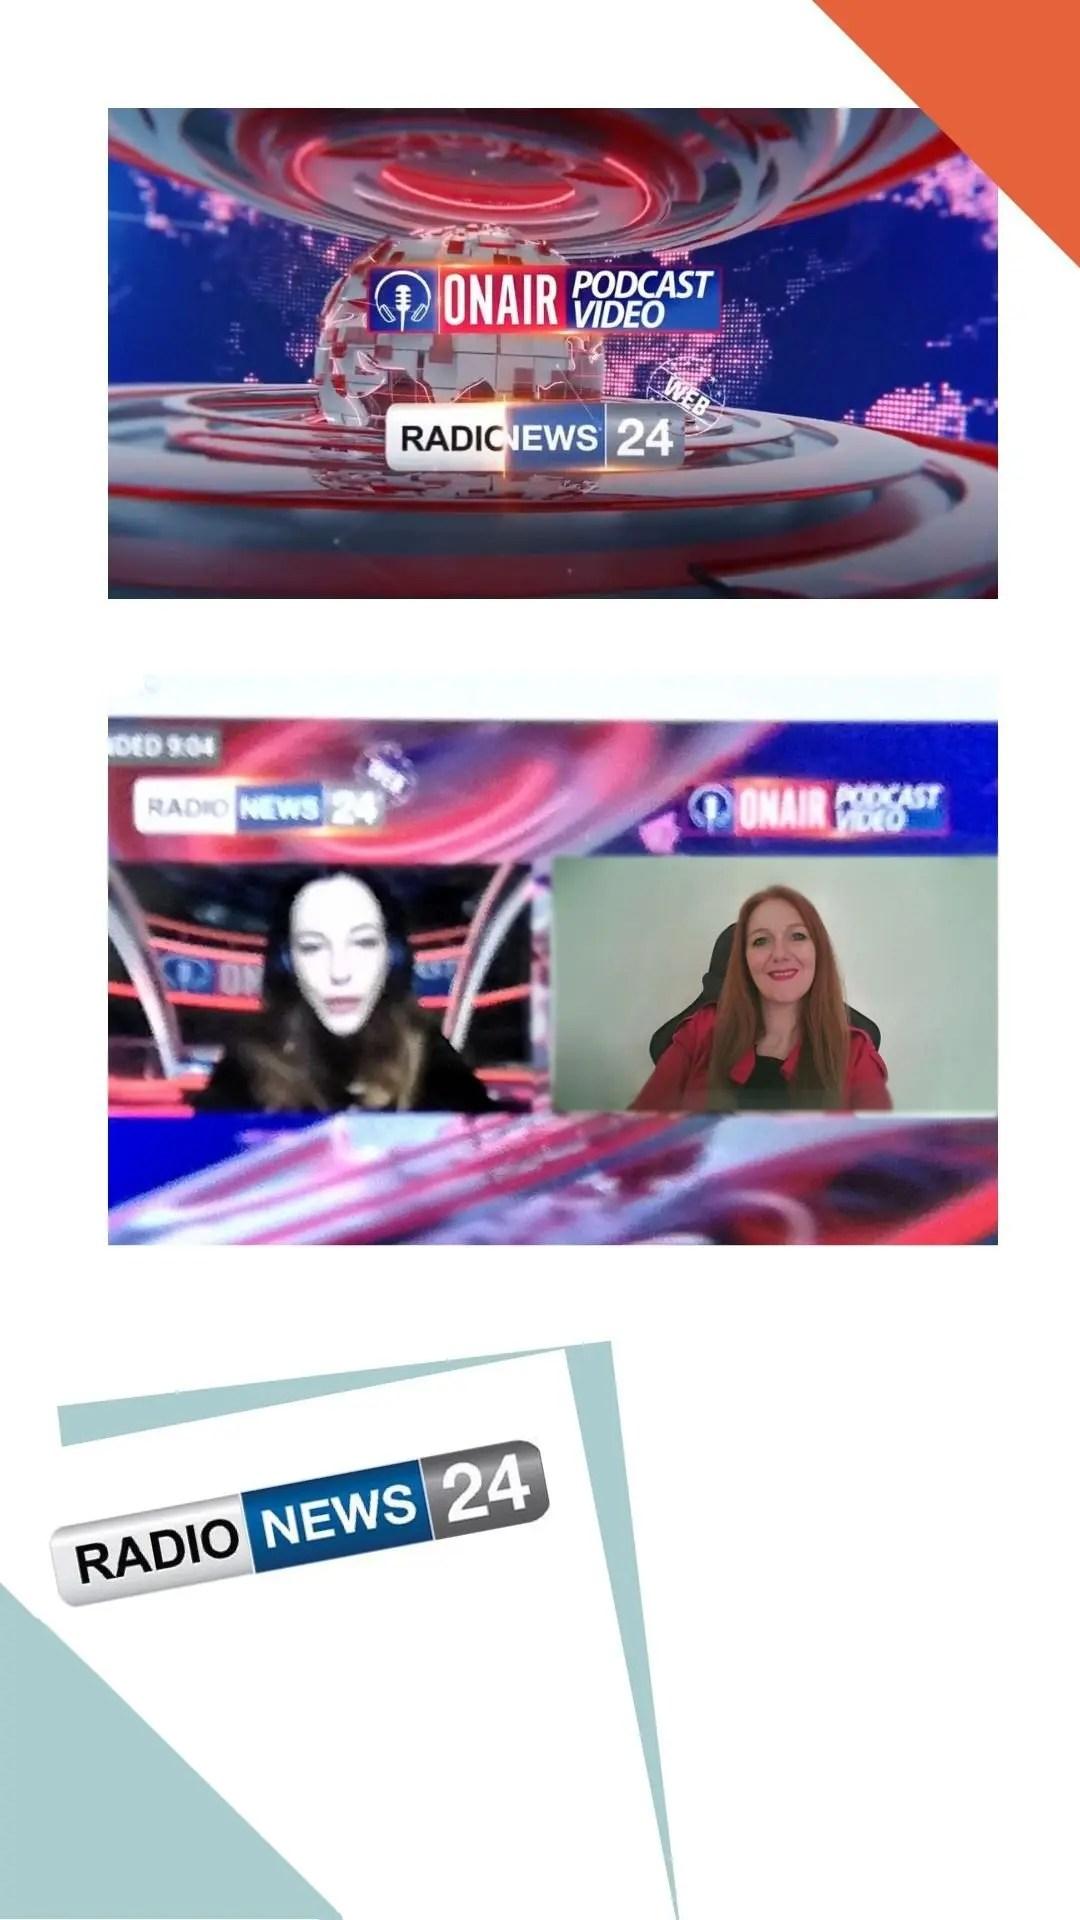 Roberta Ferrazzi - intervista Radio News 24 - LeCosmopolite.it